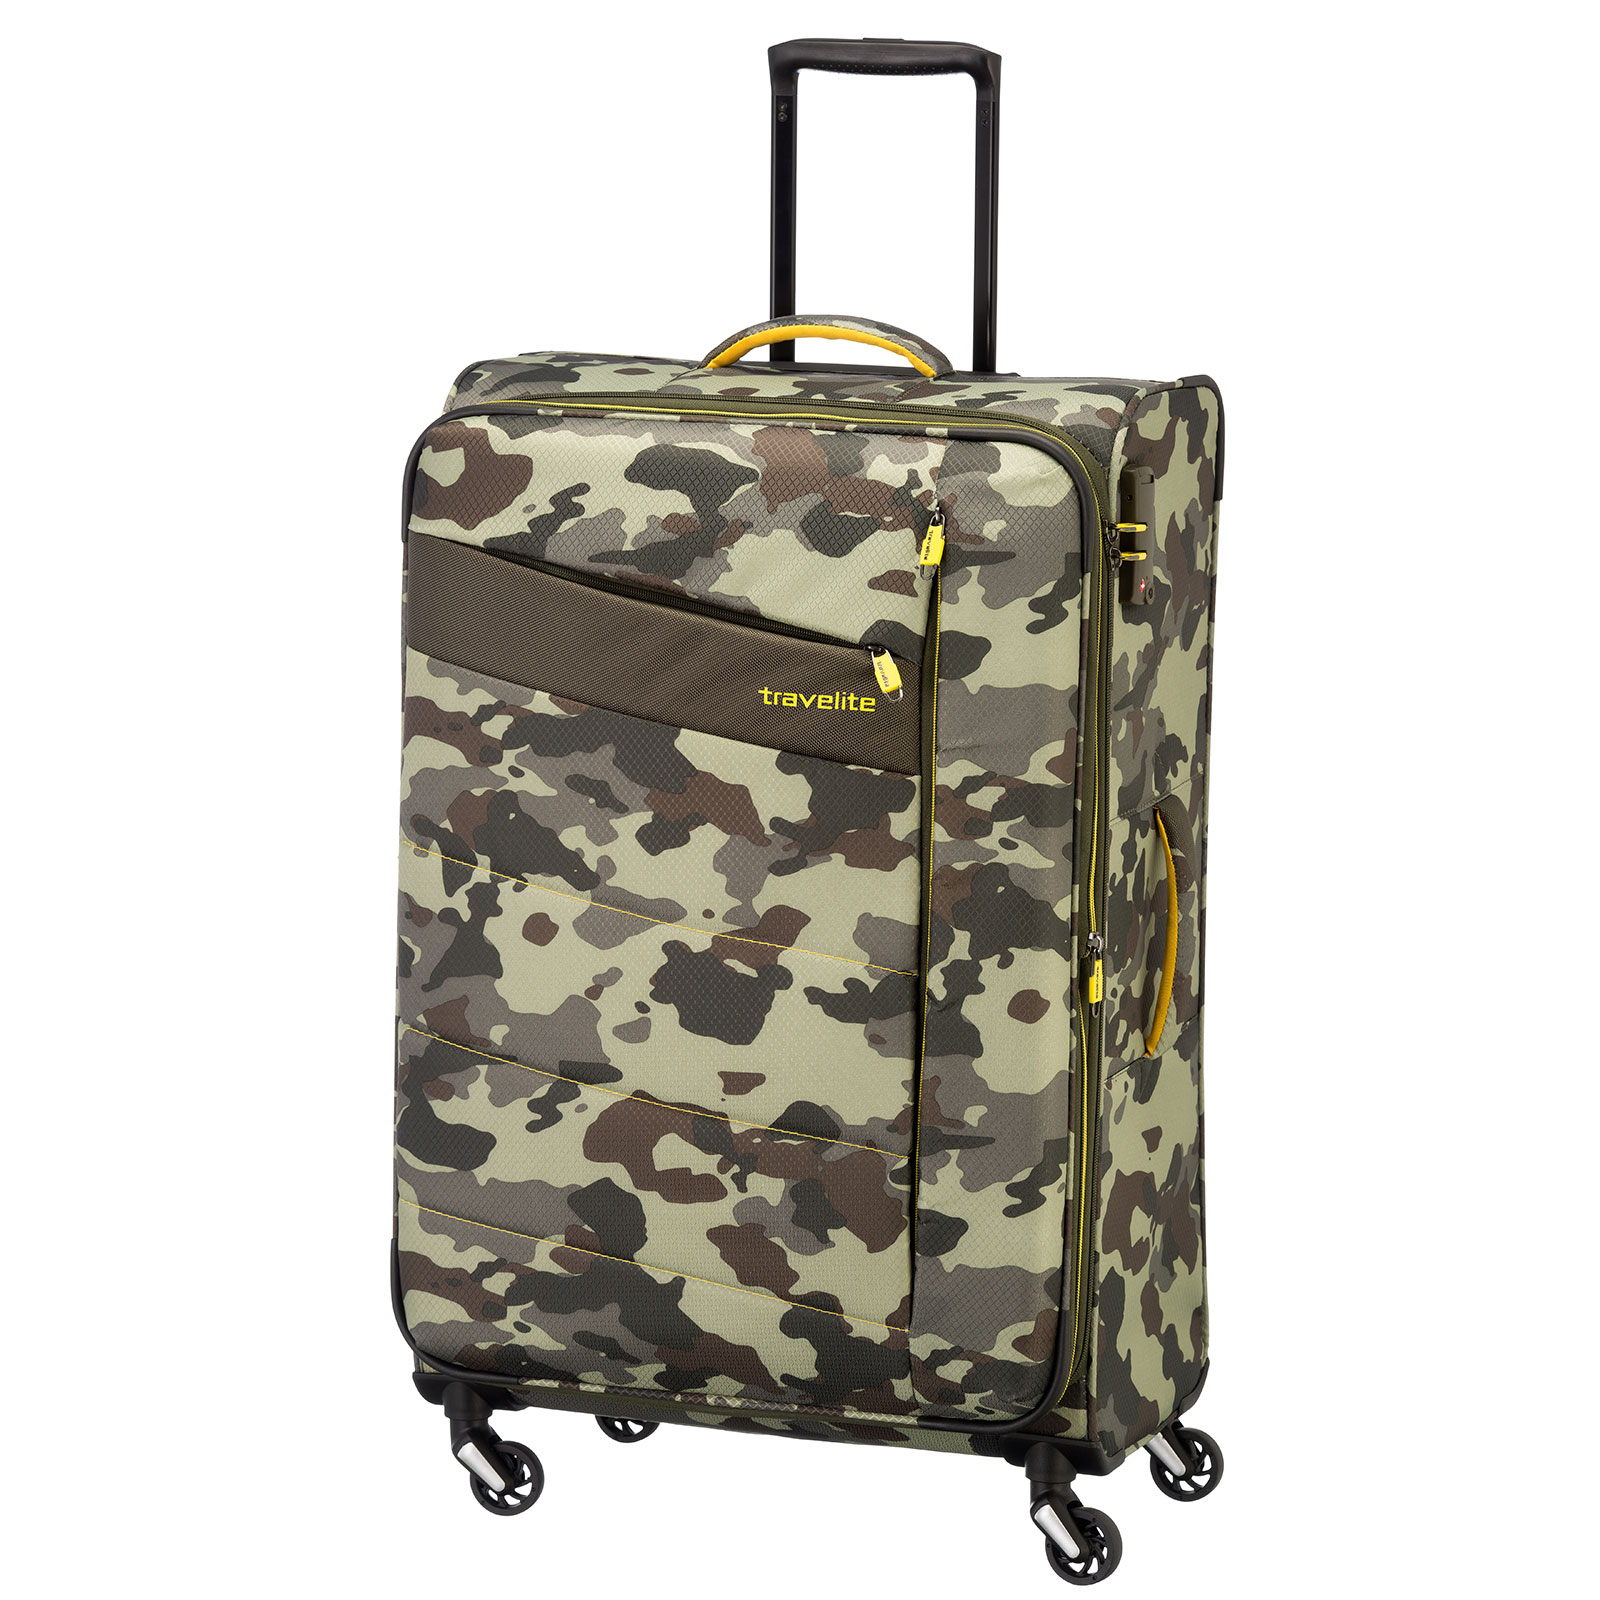 travelite koffer g nstig kaufen koffermarkt. Black Bedroom Furniture Sets. Home Design Ideas